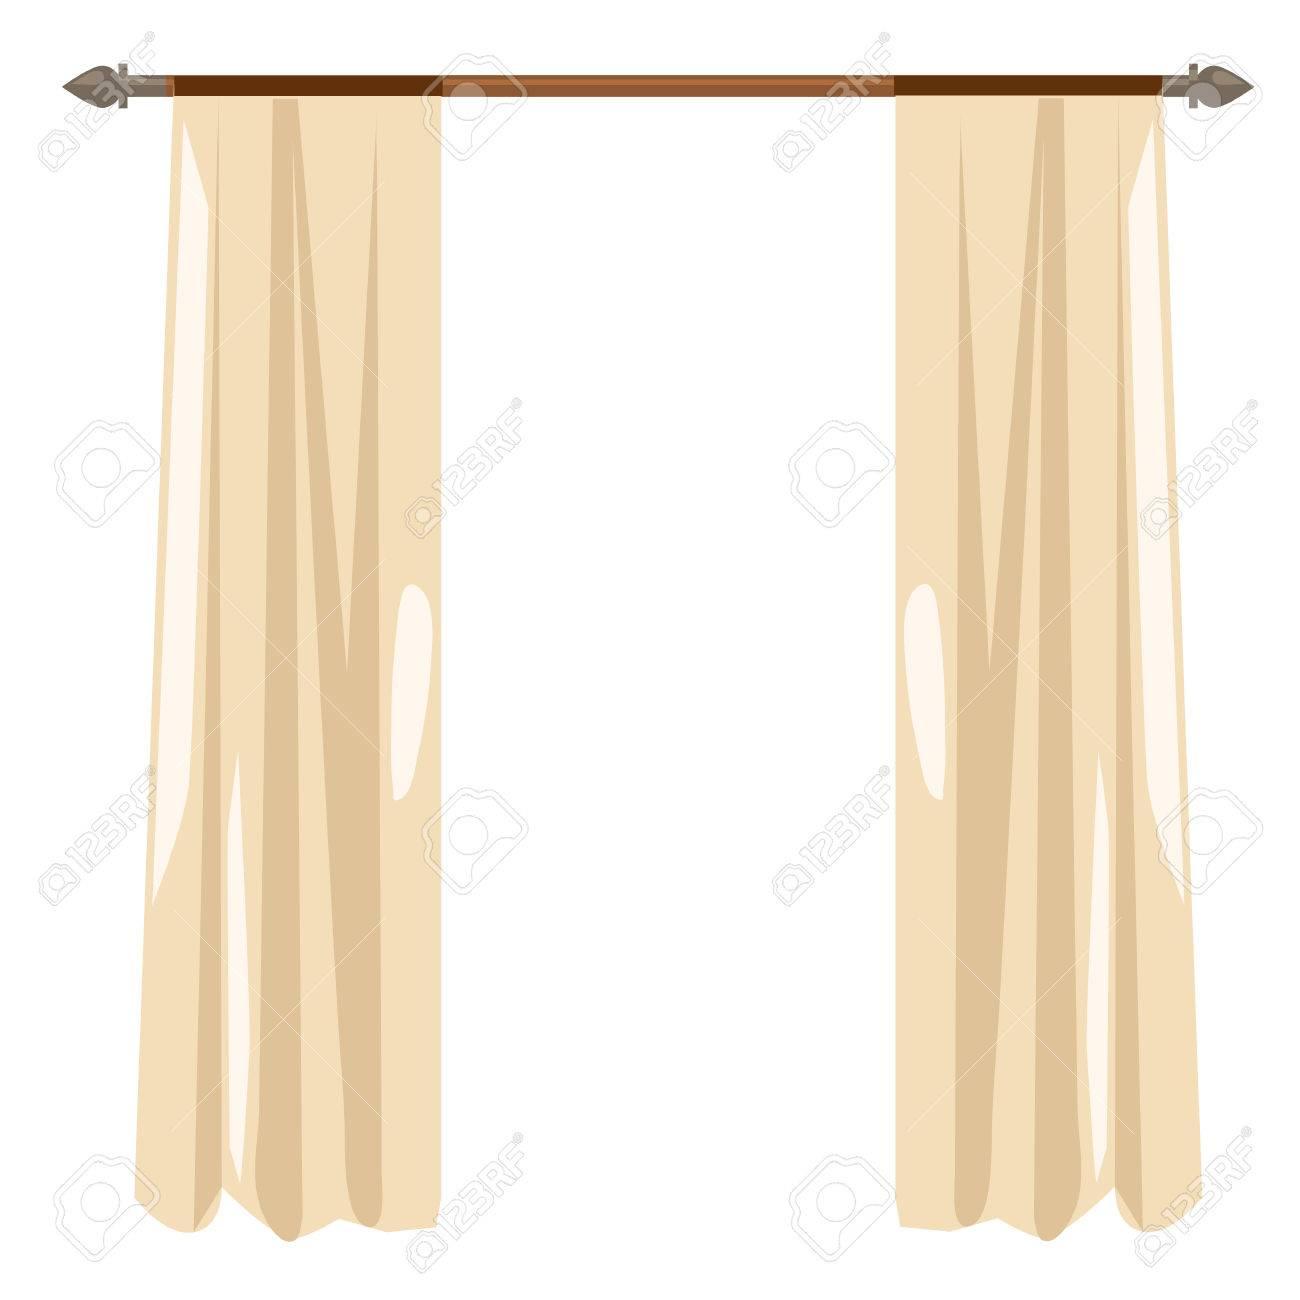 Beige Kitchen Curtains On The Ledge, Vector Illustration, Decor ...